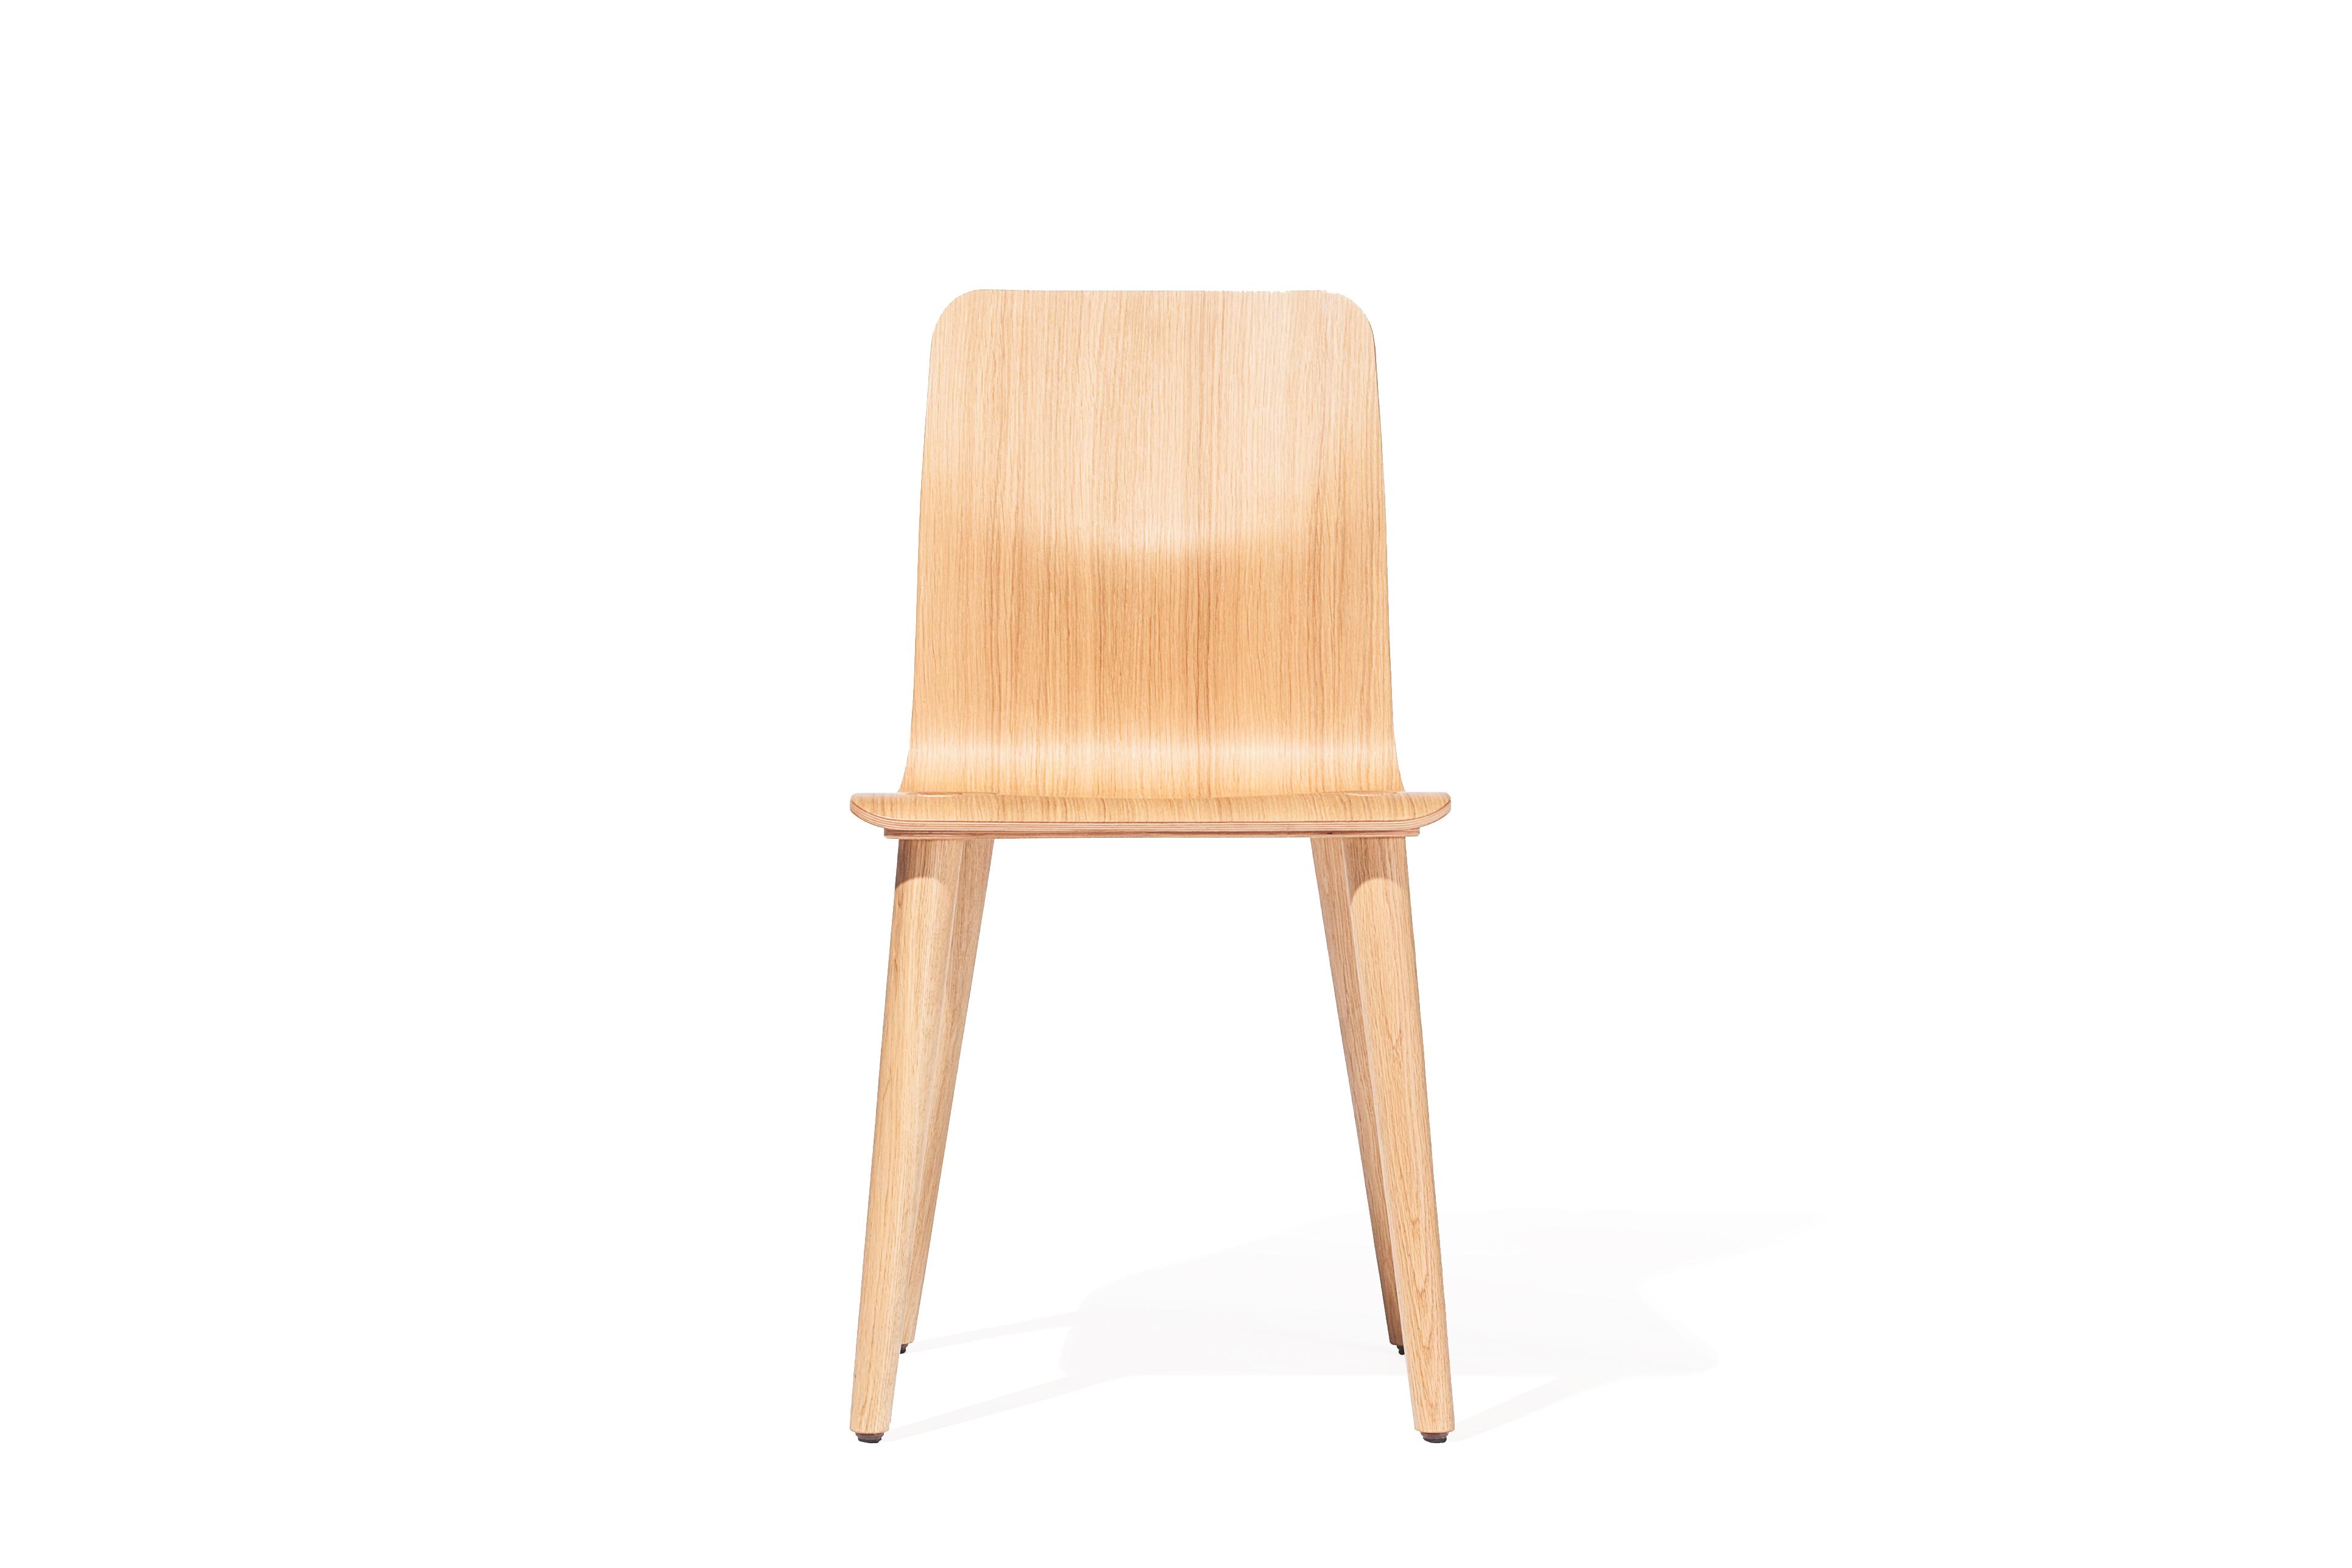 Scaun din lemn de stejar Malmo Natural, l43xA39xH82 cm